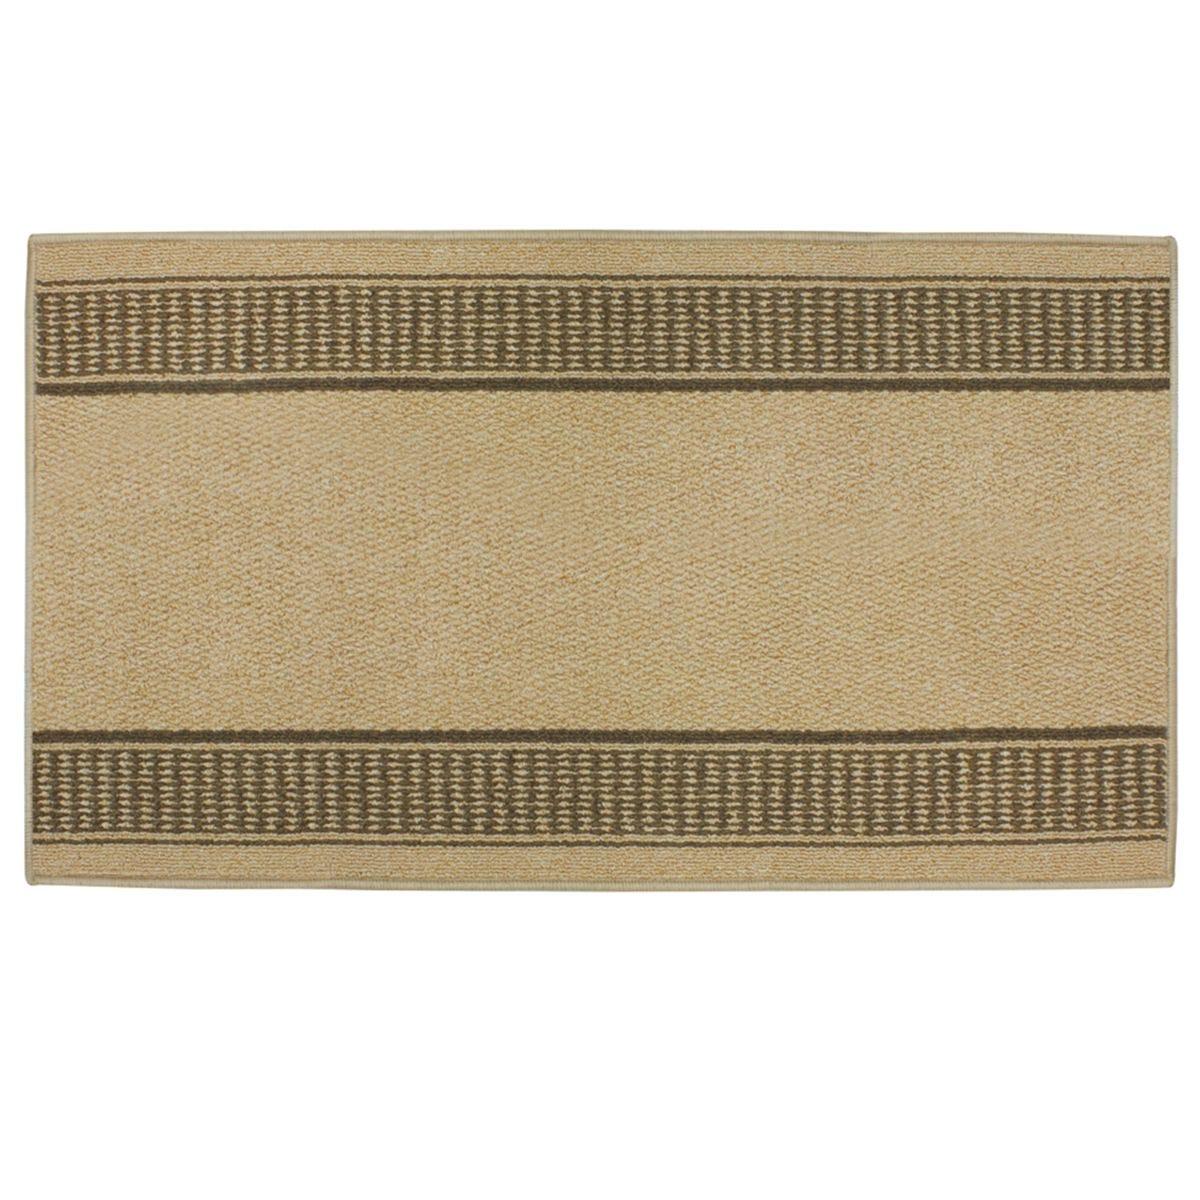 JVL 67x120cm Bergamo Runner Machine Washable Doormat - Beige/Brown